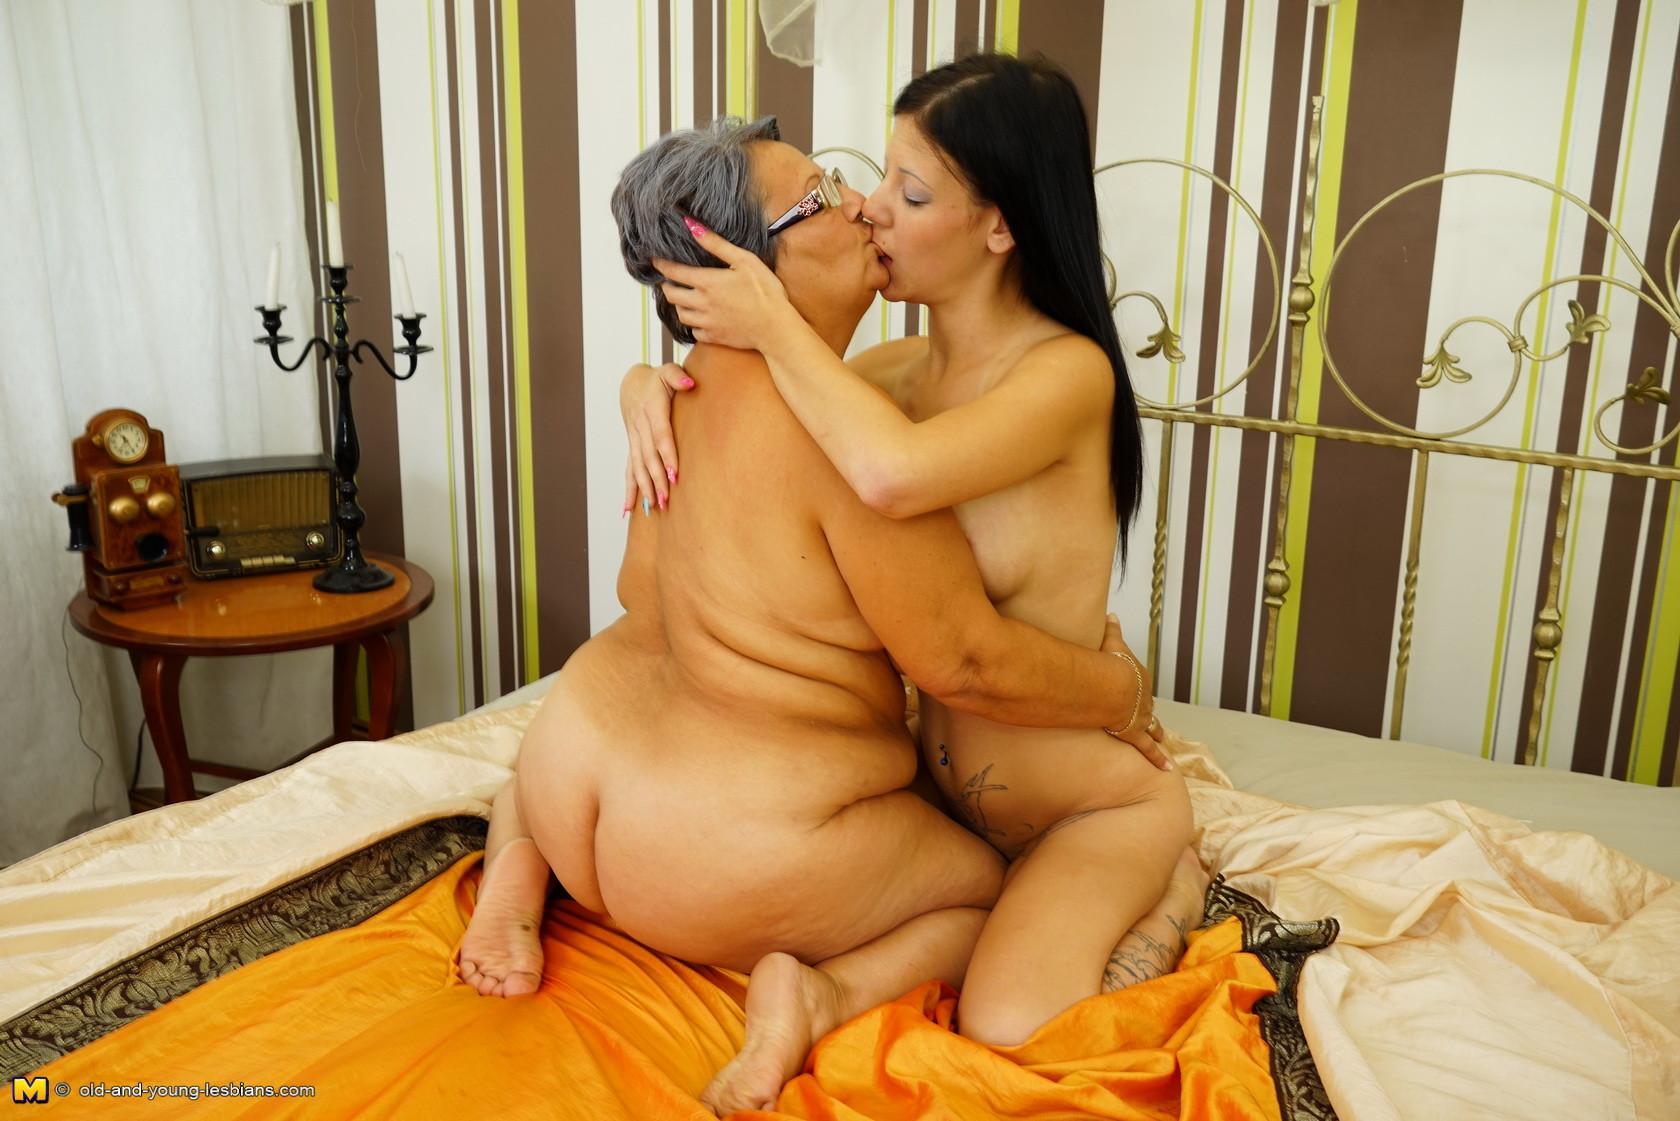 Lesbian Couple Seduce Teen